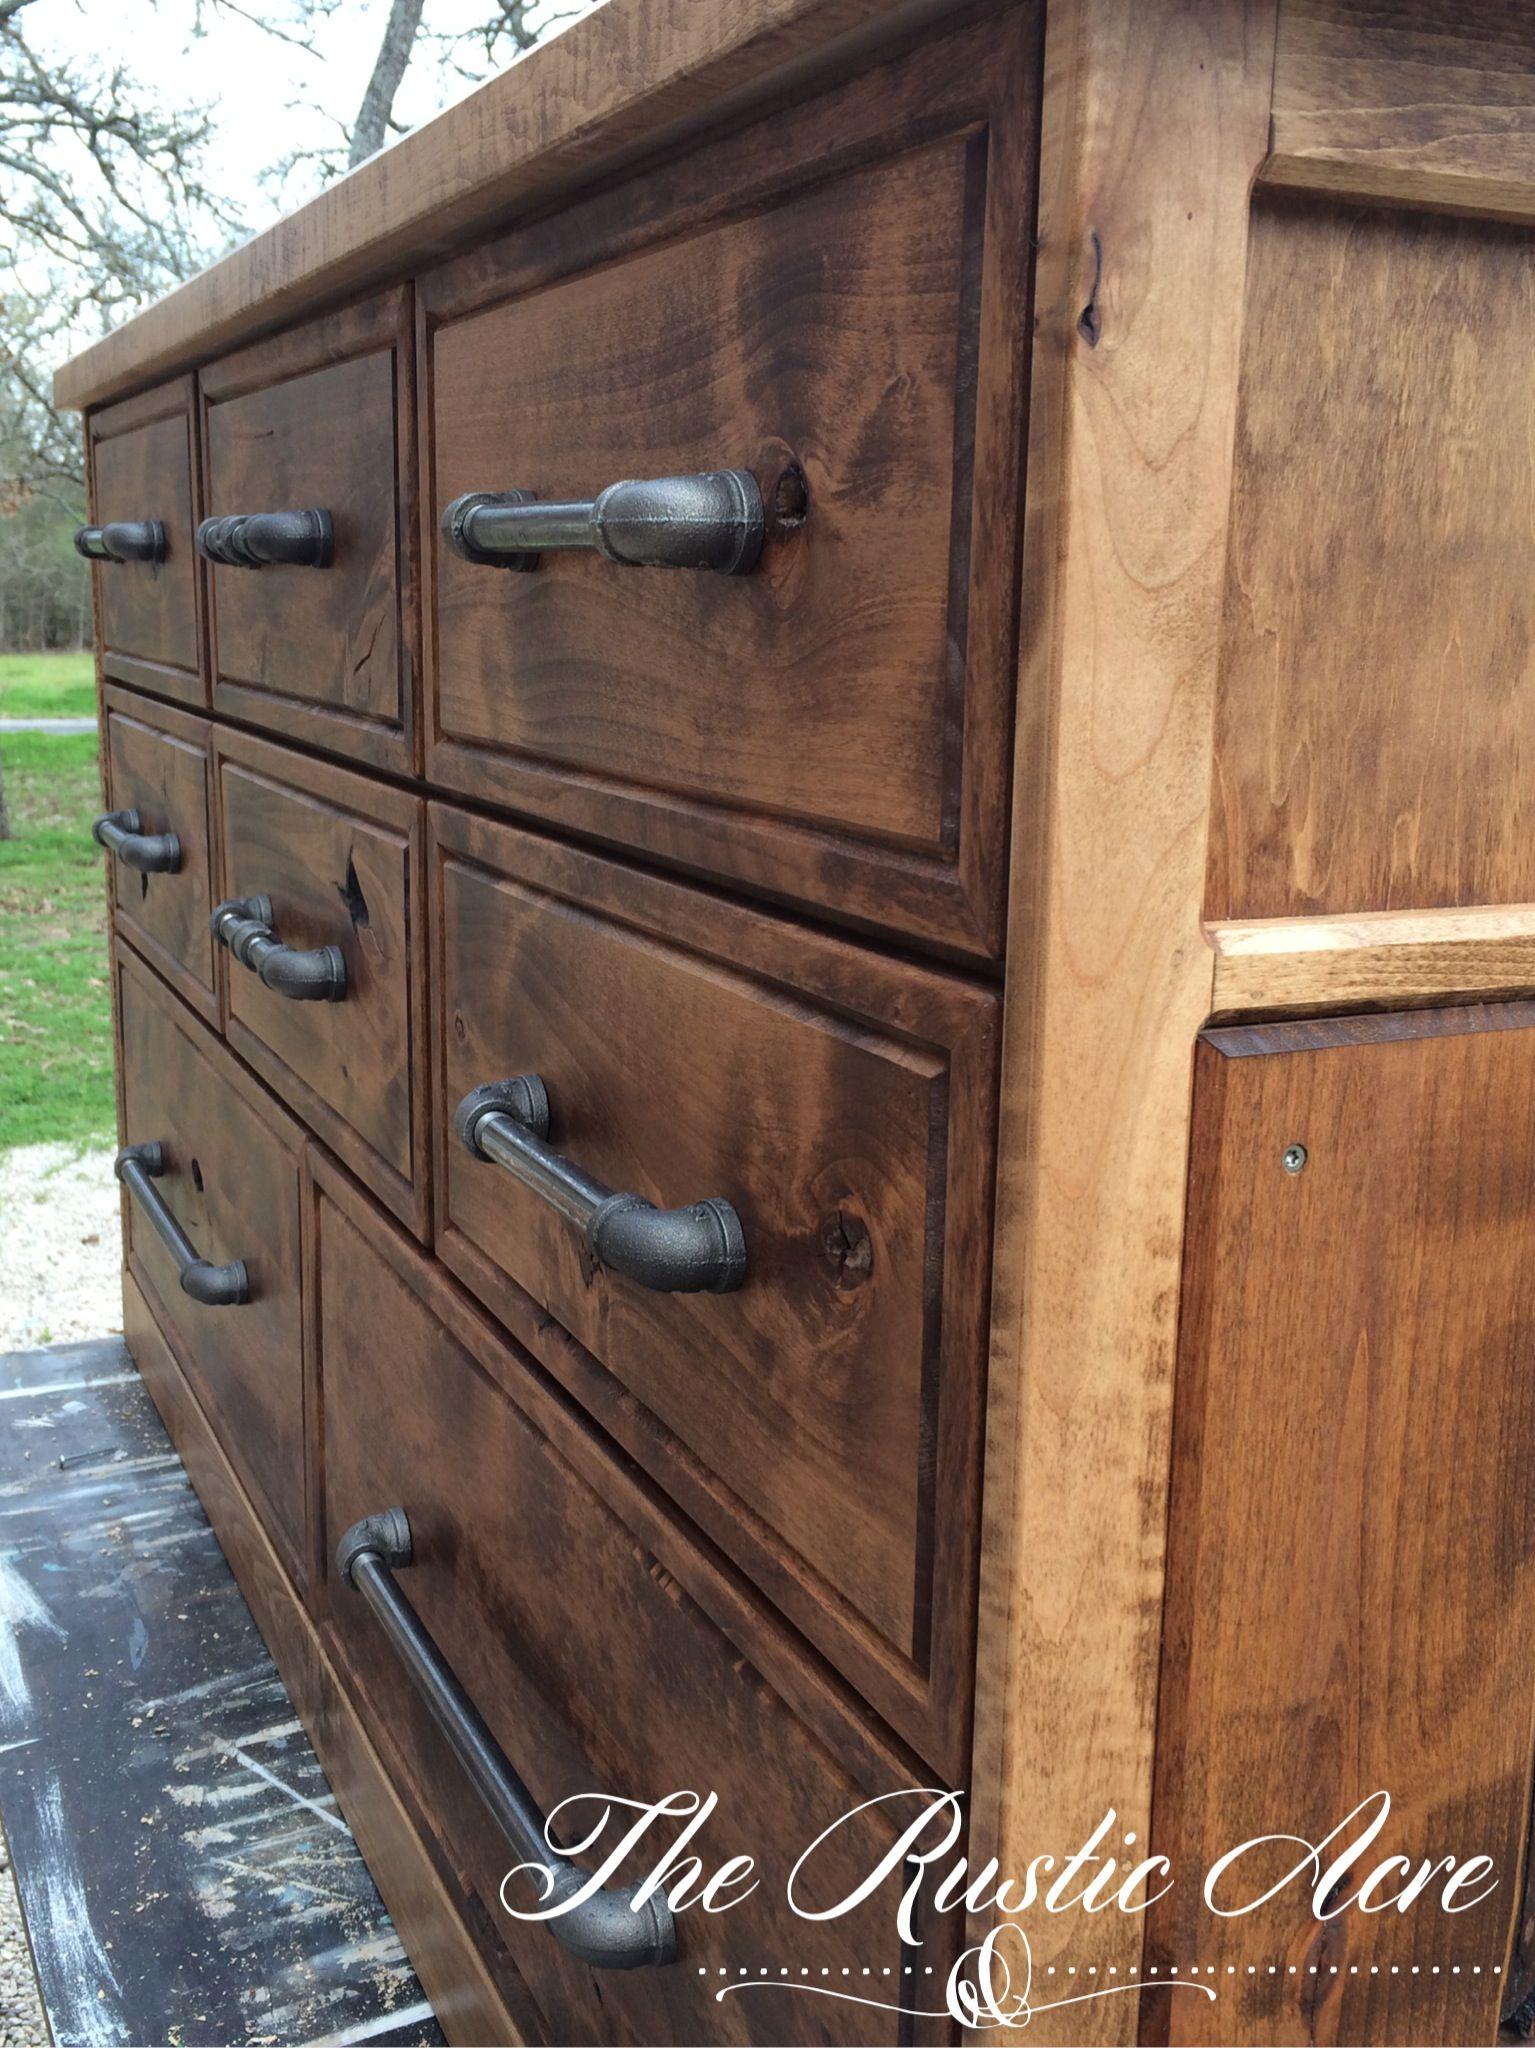 Custom Built Rustic Dresser with knotty Alder and Maple hardwood ...